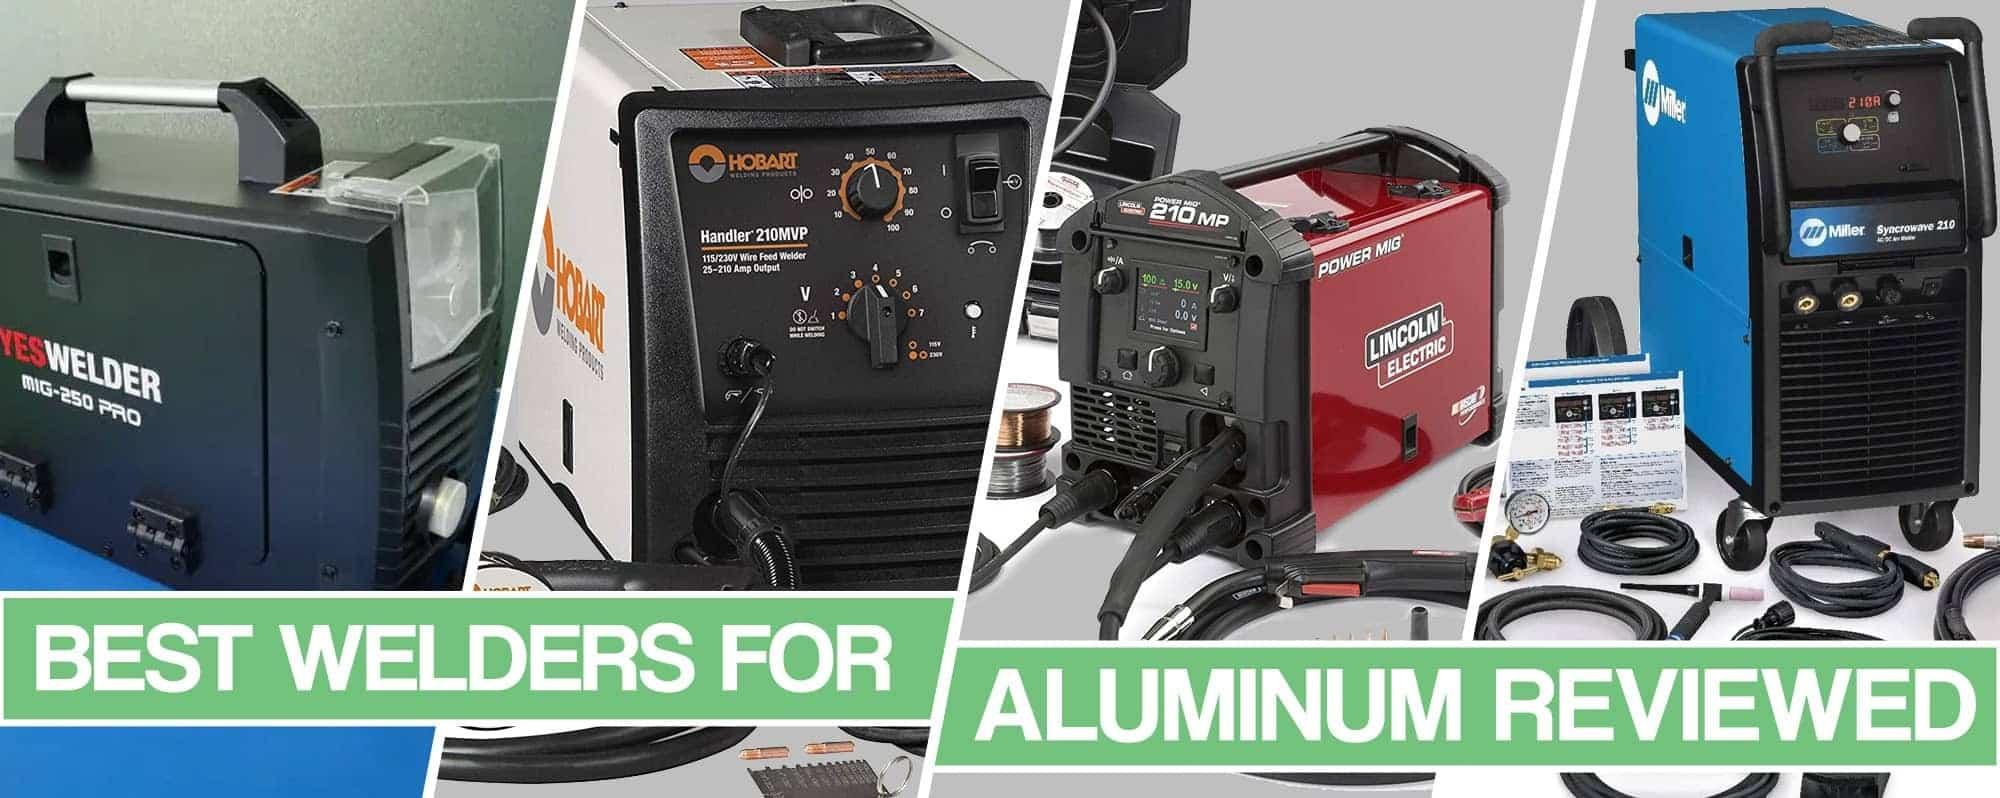 Best welder for aluminum featured image